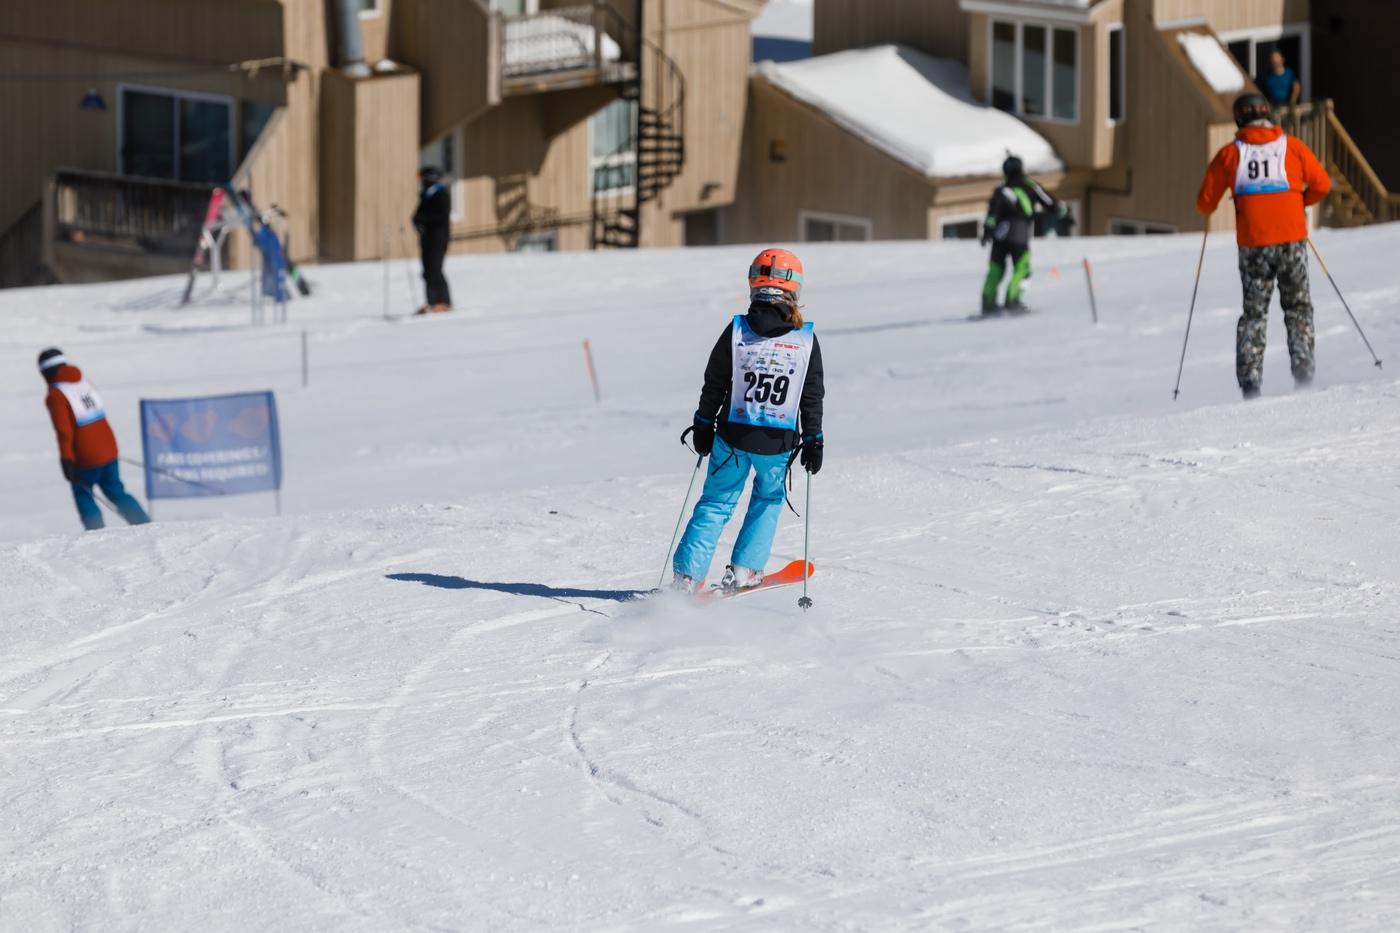 WinterKids Downhill 24 2021 SDP 3178